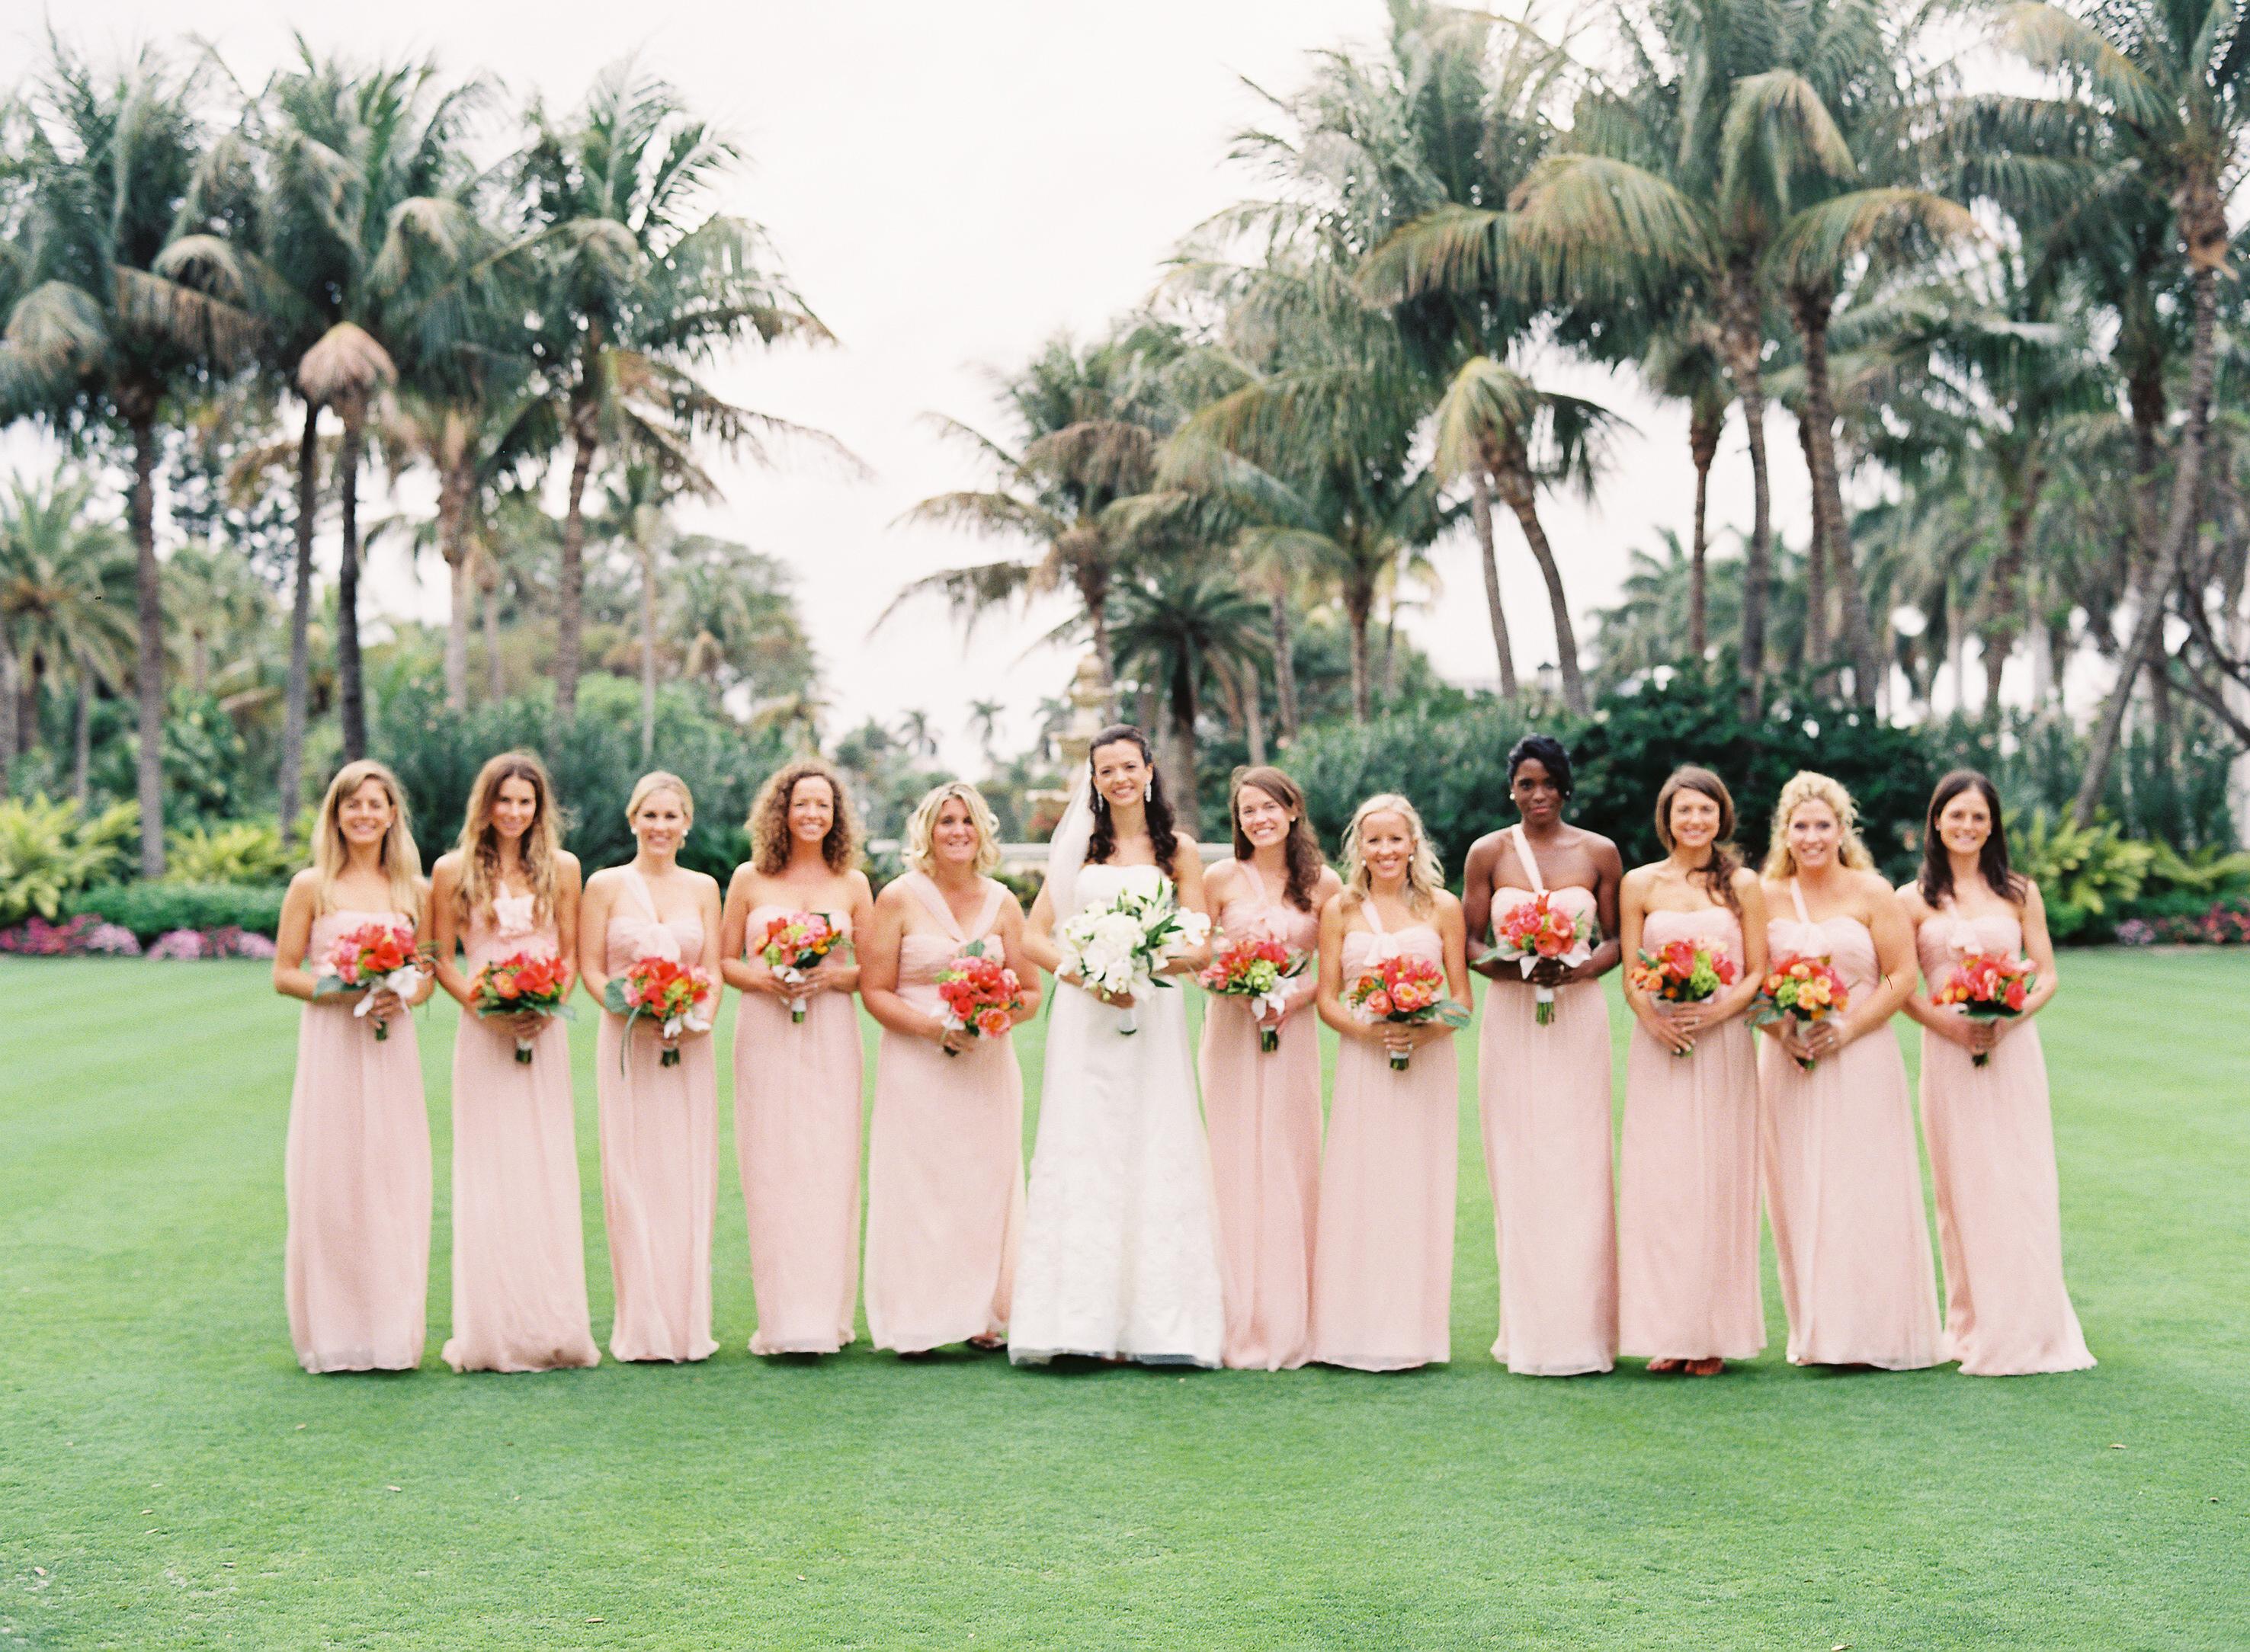 Bridesmaids, Real Weddings, pink, Classic, Southern Real Weddings, Bridal party, Elegant, Florida, Southern weddings, florida real weddings, florida weddings